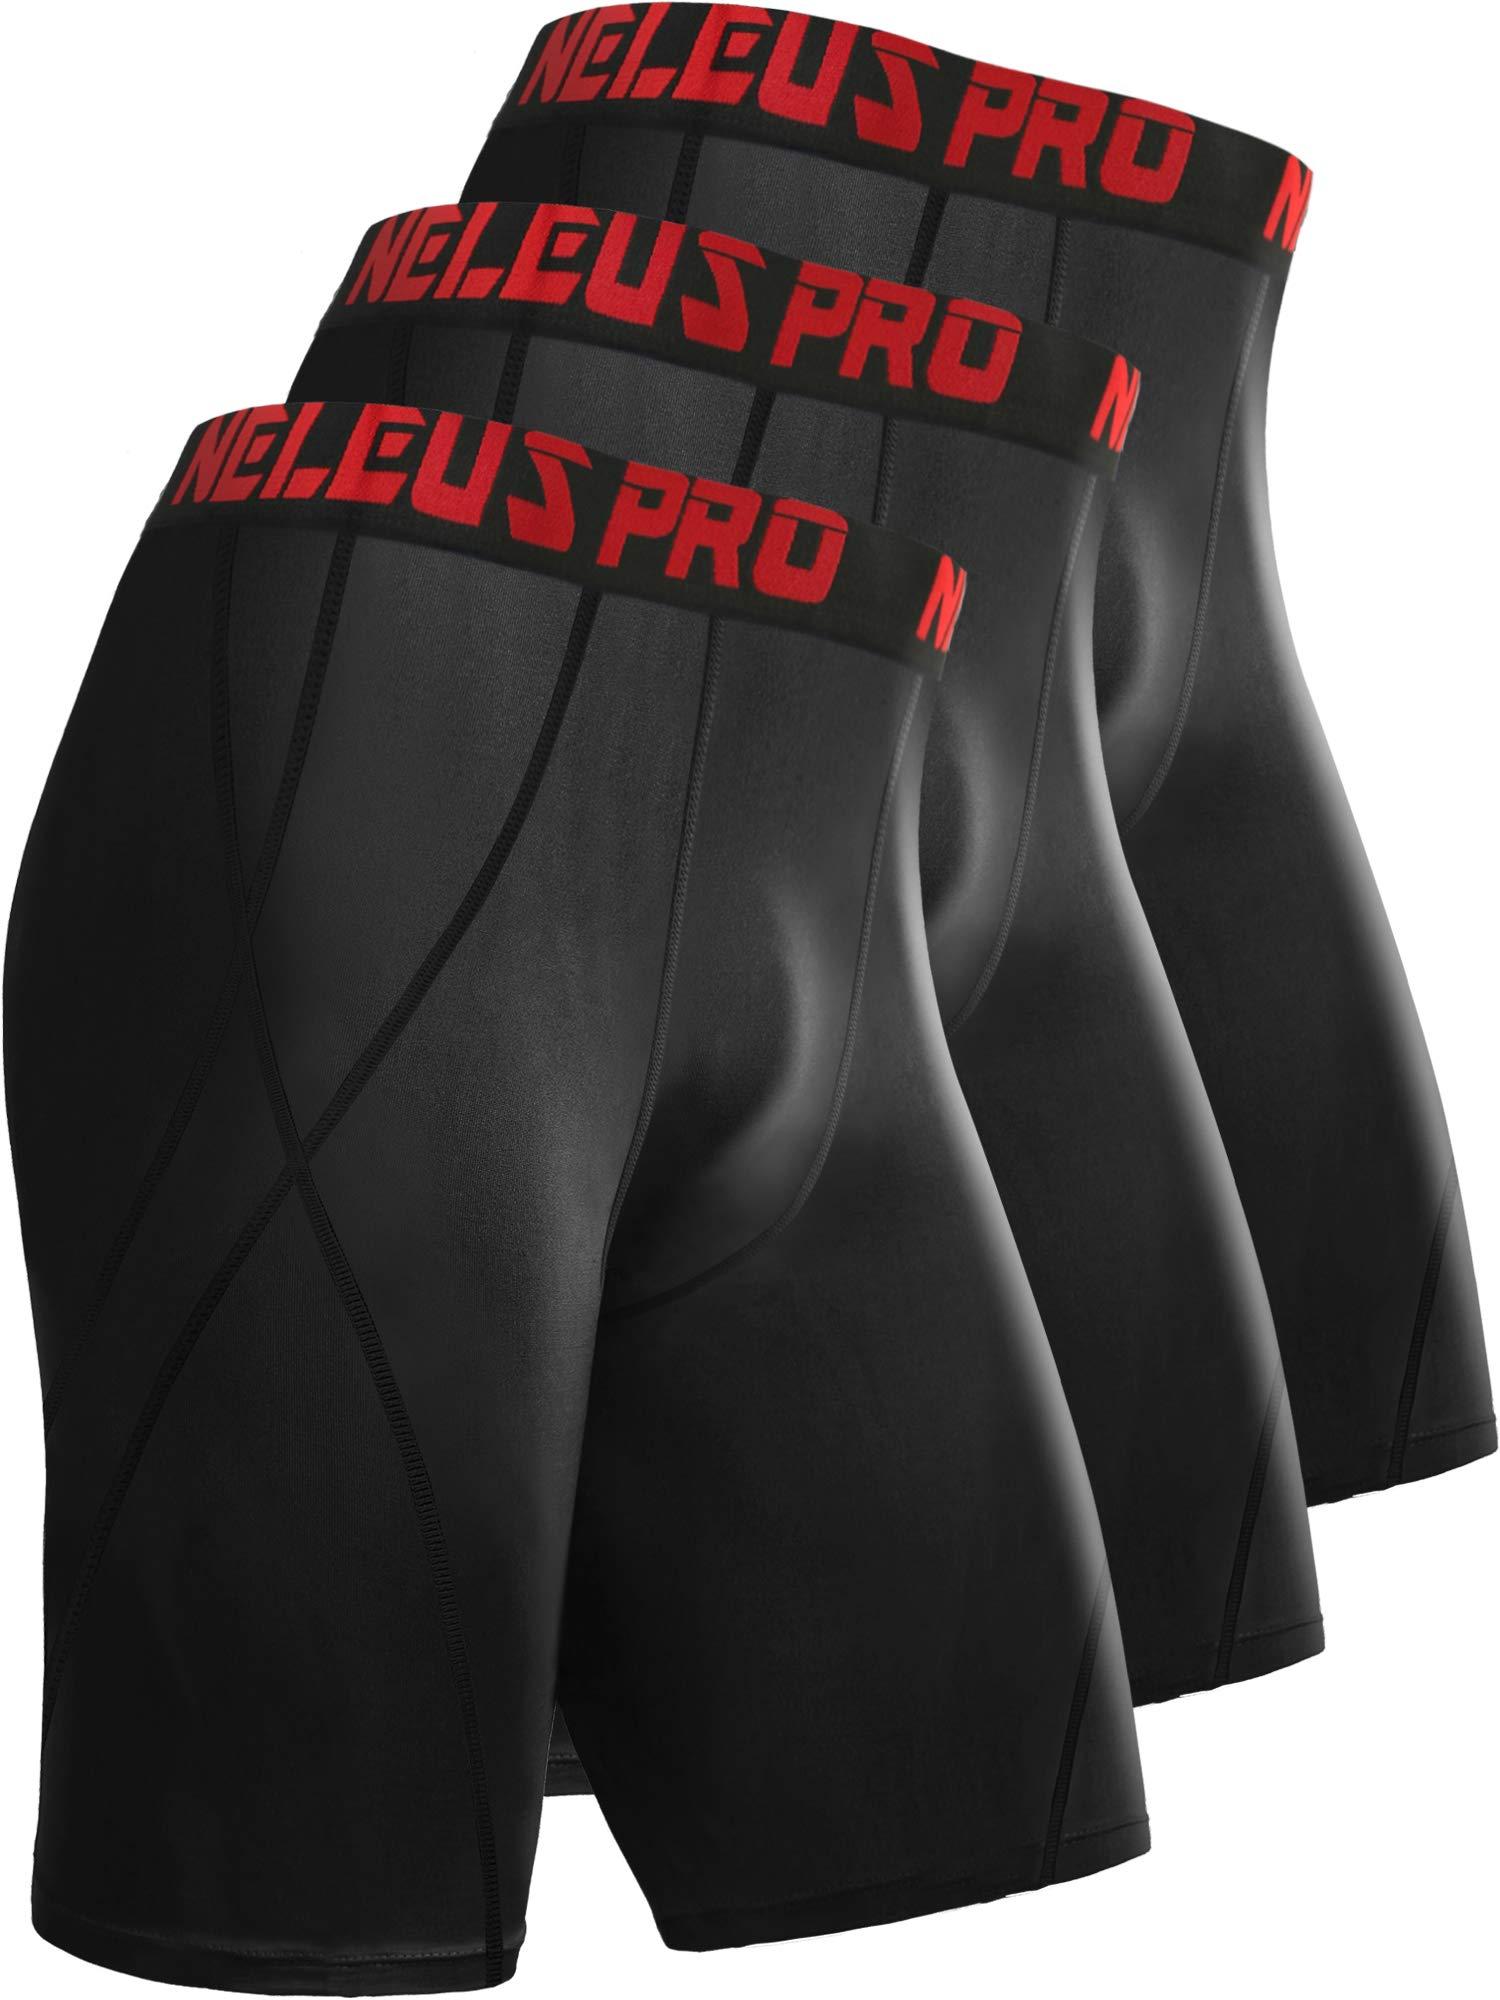 Neleus Men's 8 inch Compression Shorts,6010,3 Pack:Black,L,EU XL by Neleus